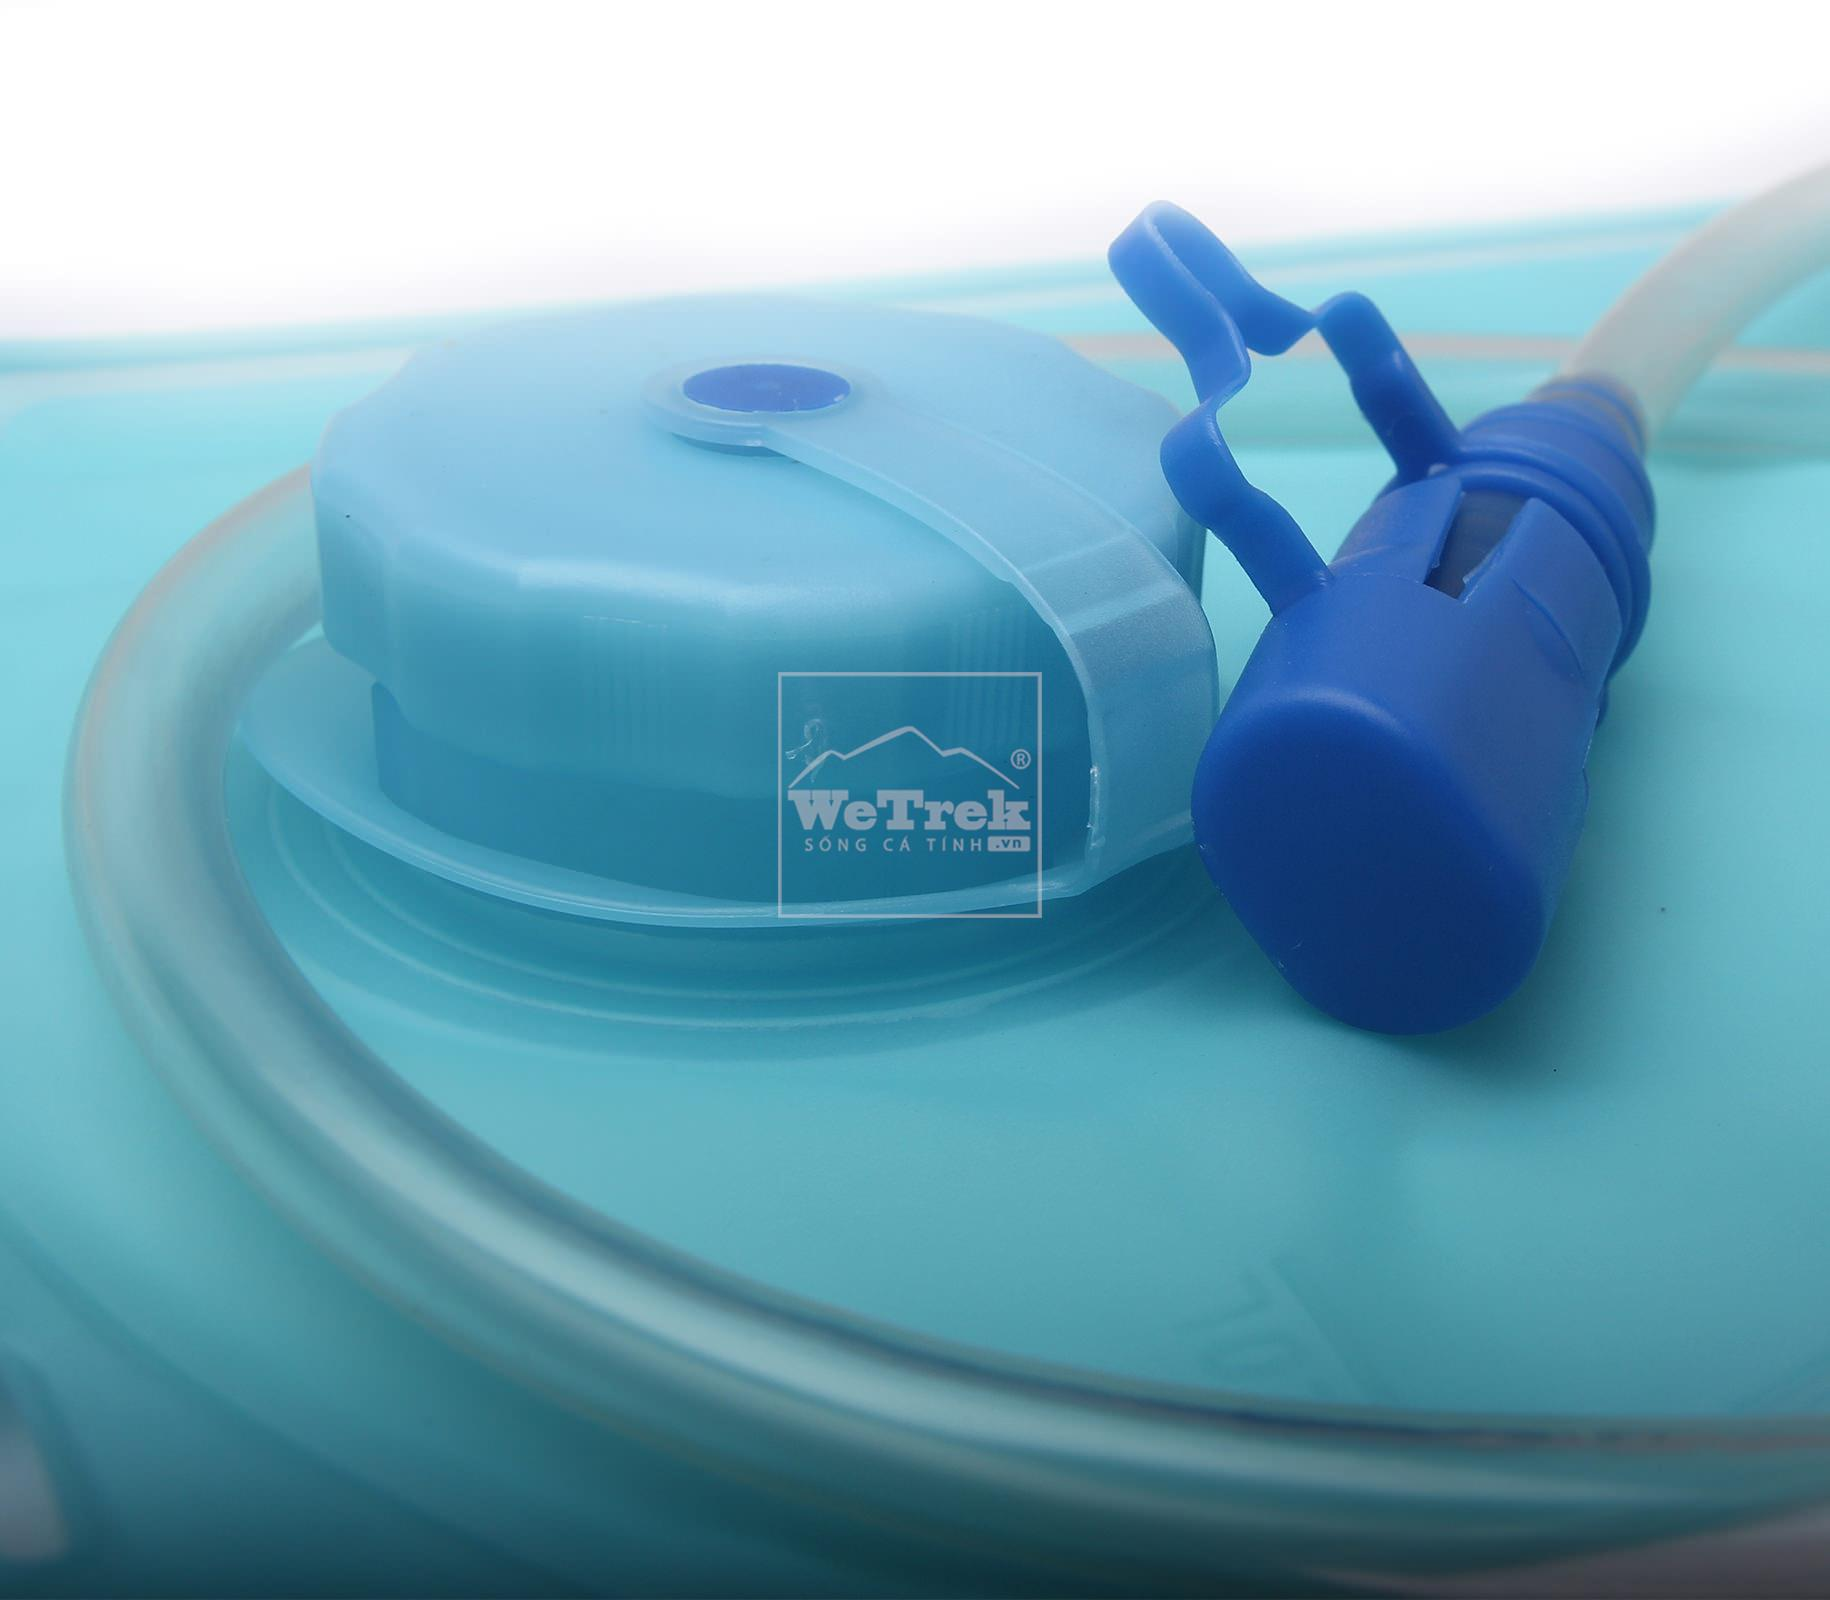 tui-nuoc-da-ngoai-2l-ryder-tpu-water-reservoir-with-bite-valve-cap-a0001-7302-wetrek.vn-1